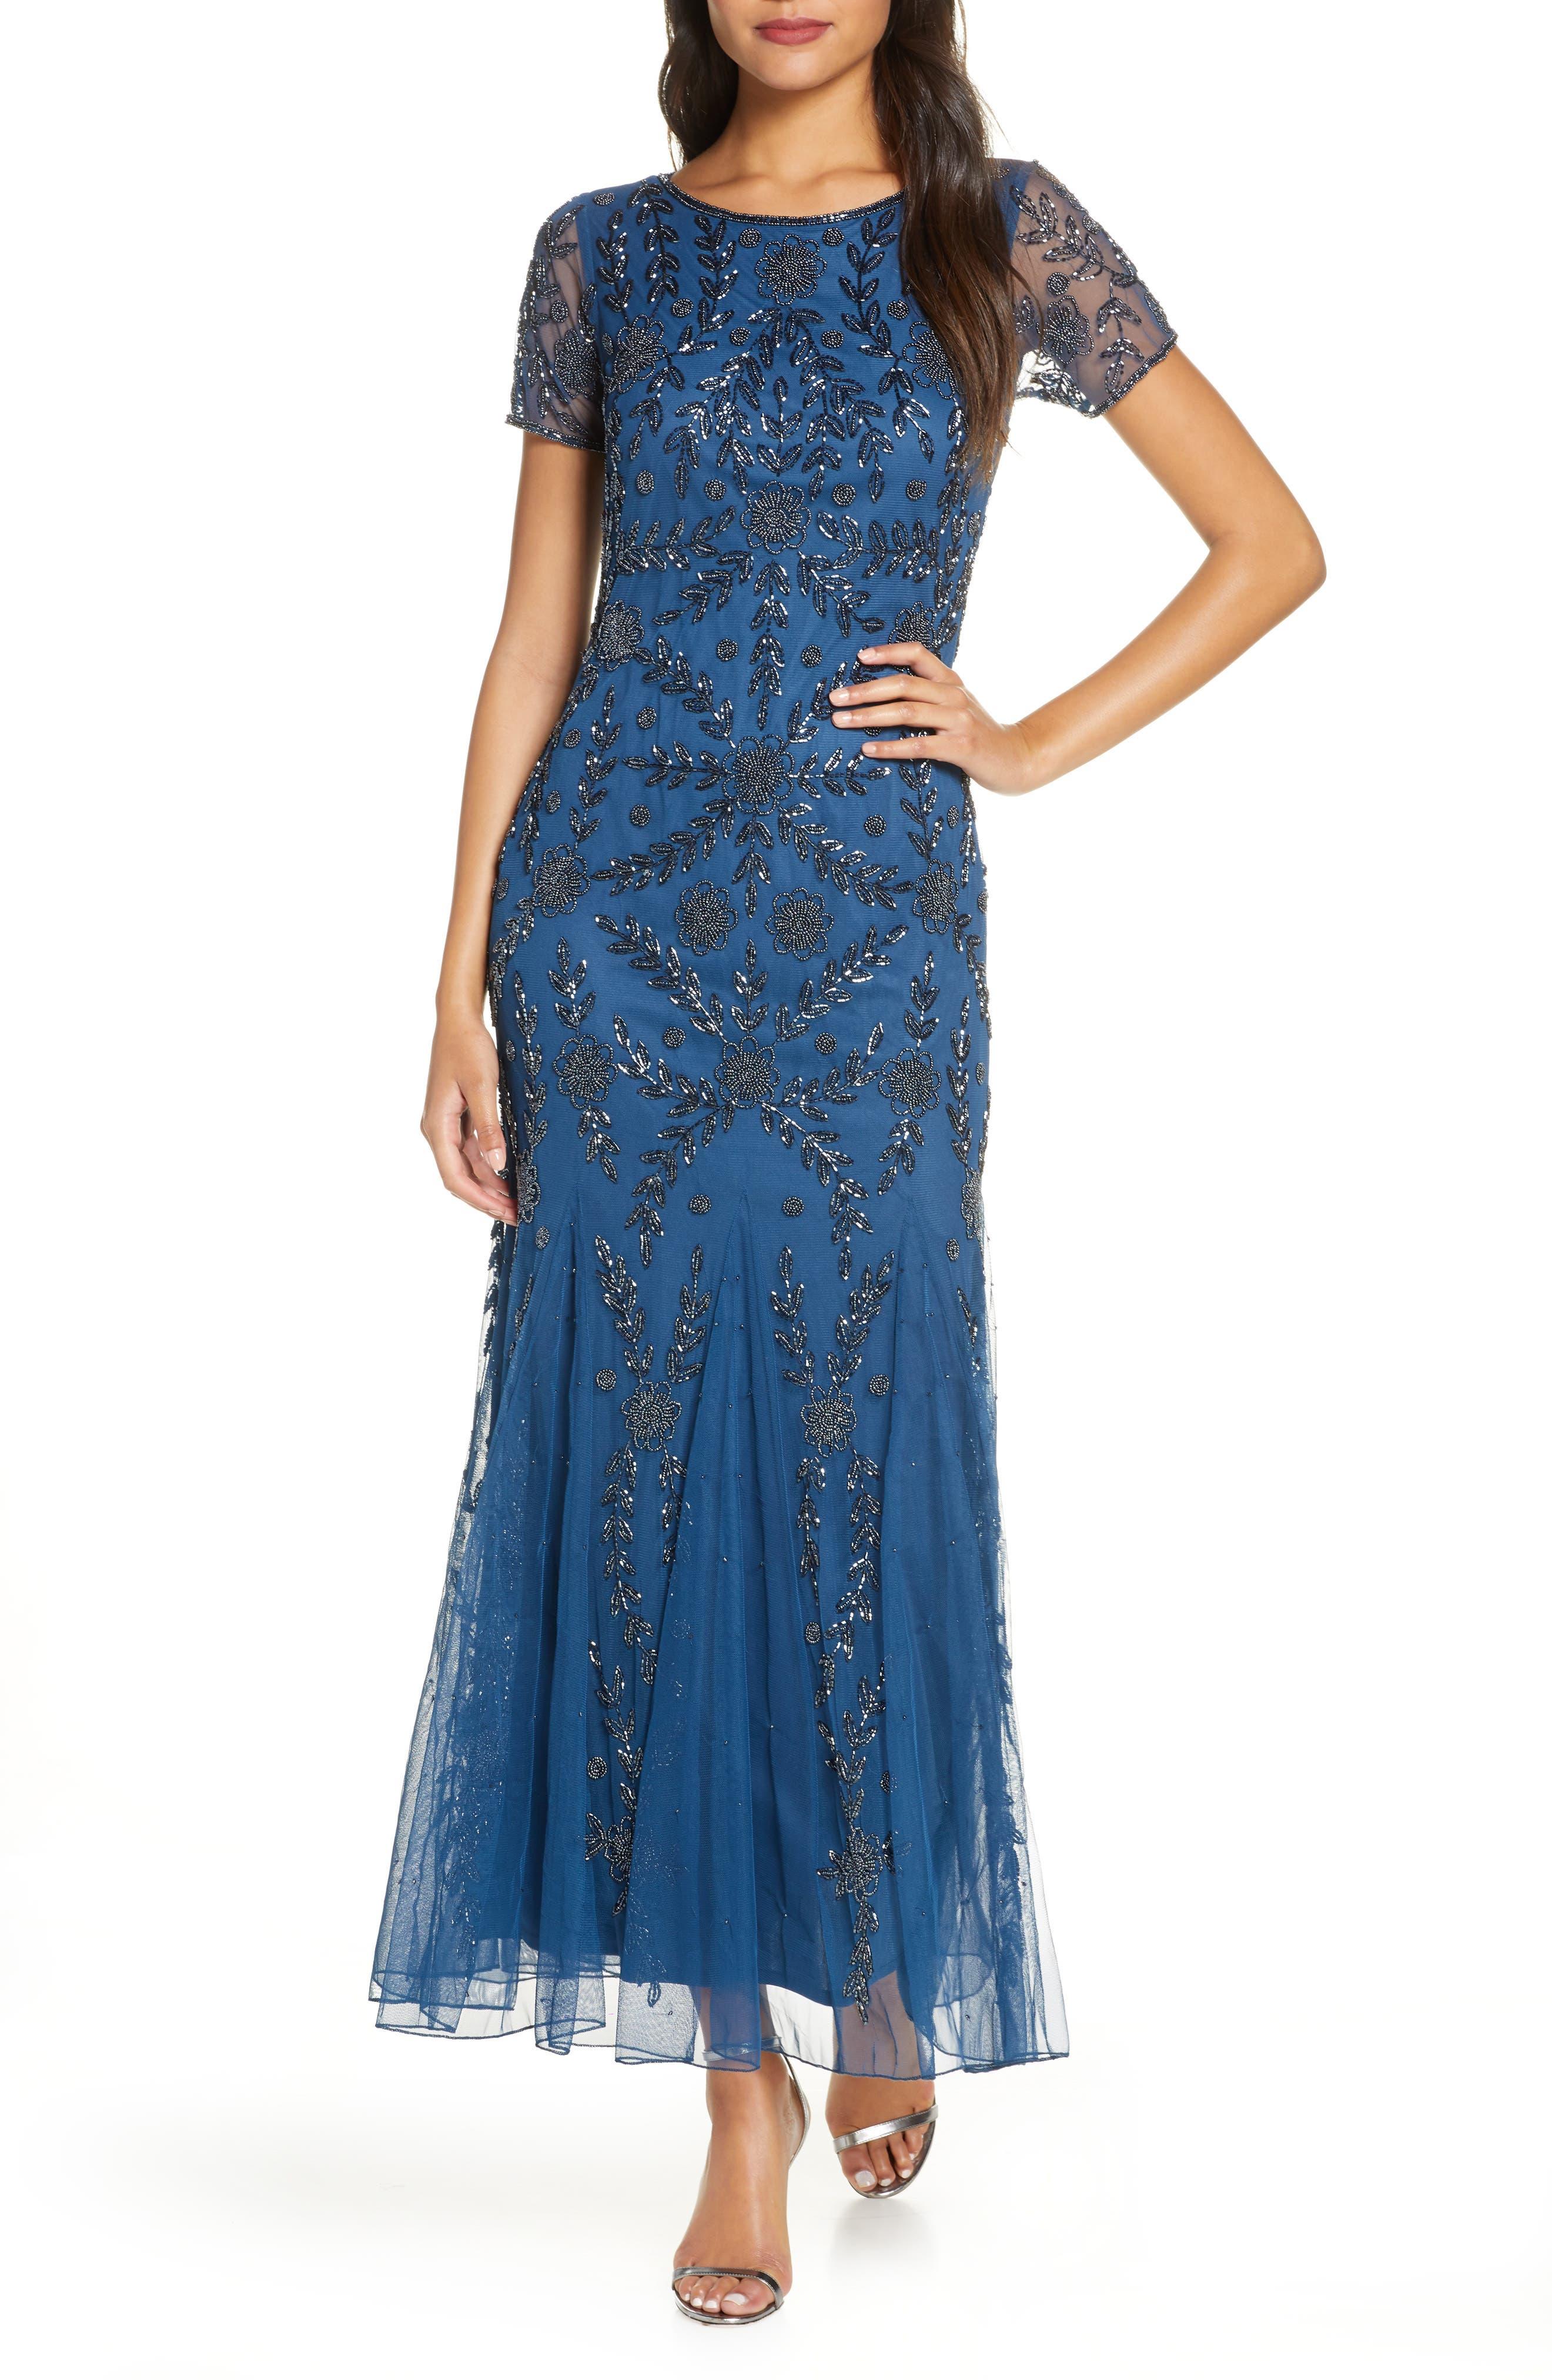 1920s Style Dresses, 20s Dresses Womens Pisarro Nights Embellished Mesh Gown $142.80 AT vintagedancer.com